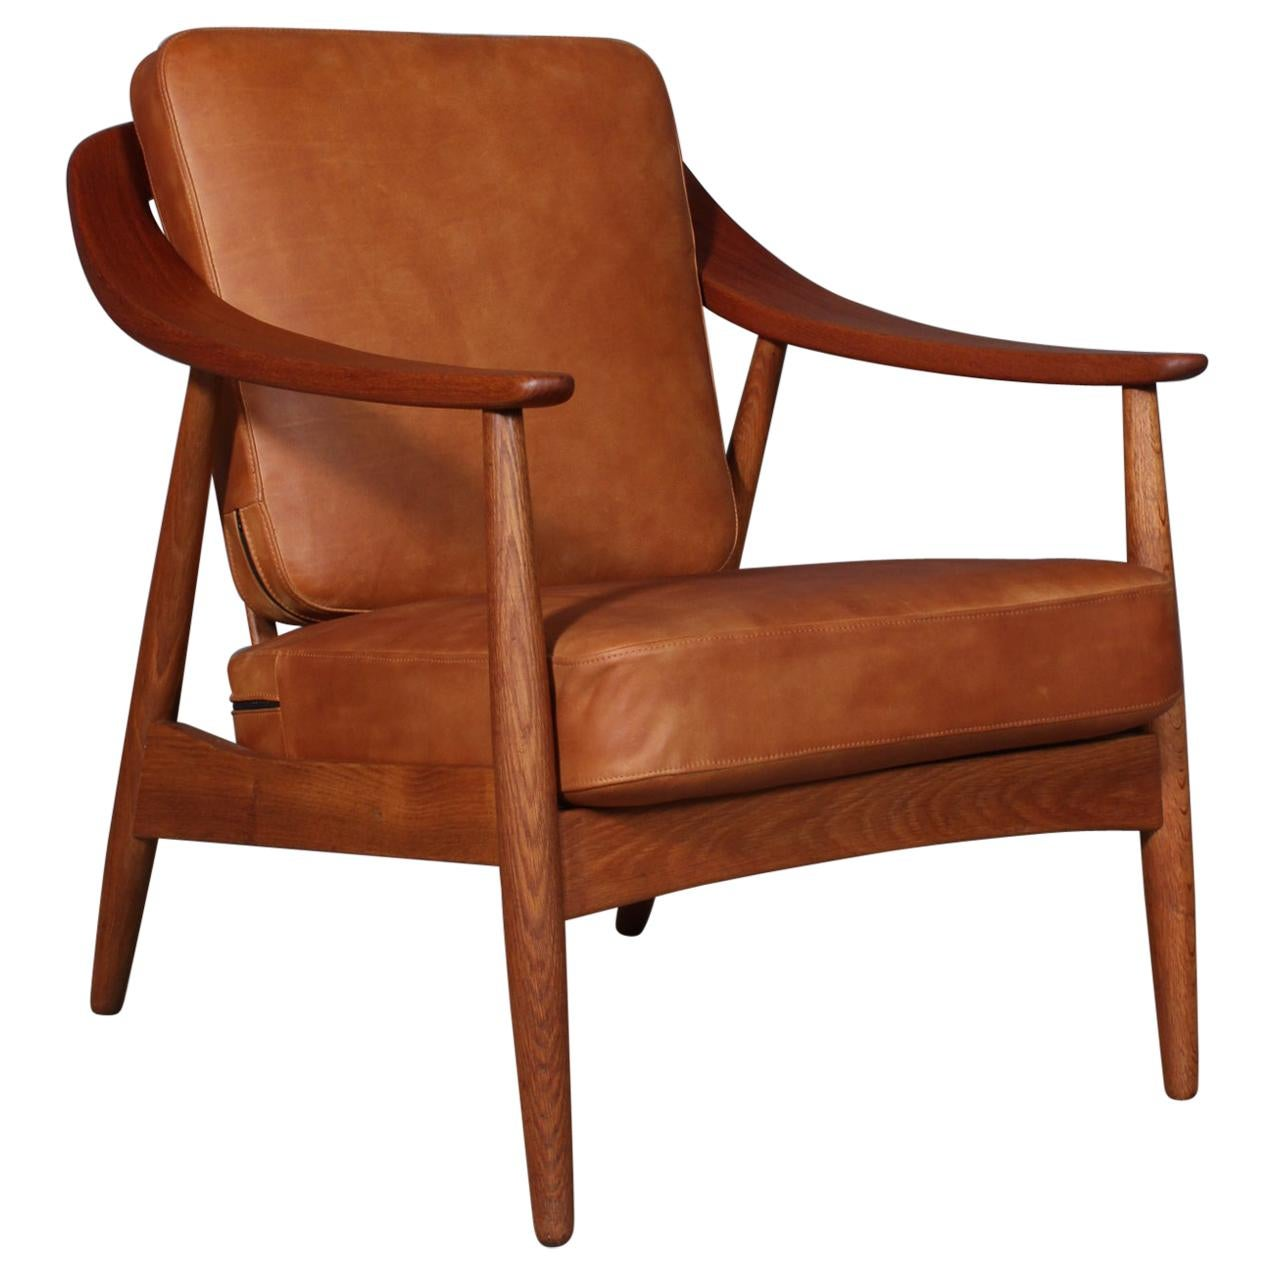 Illum Wikkelsø Lounge Chair